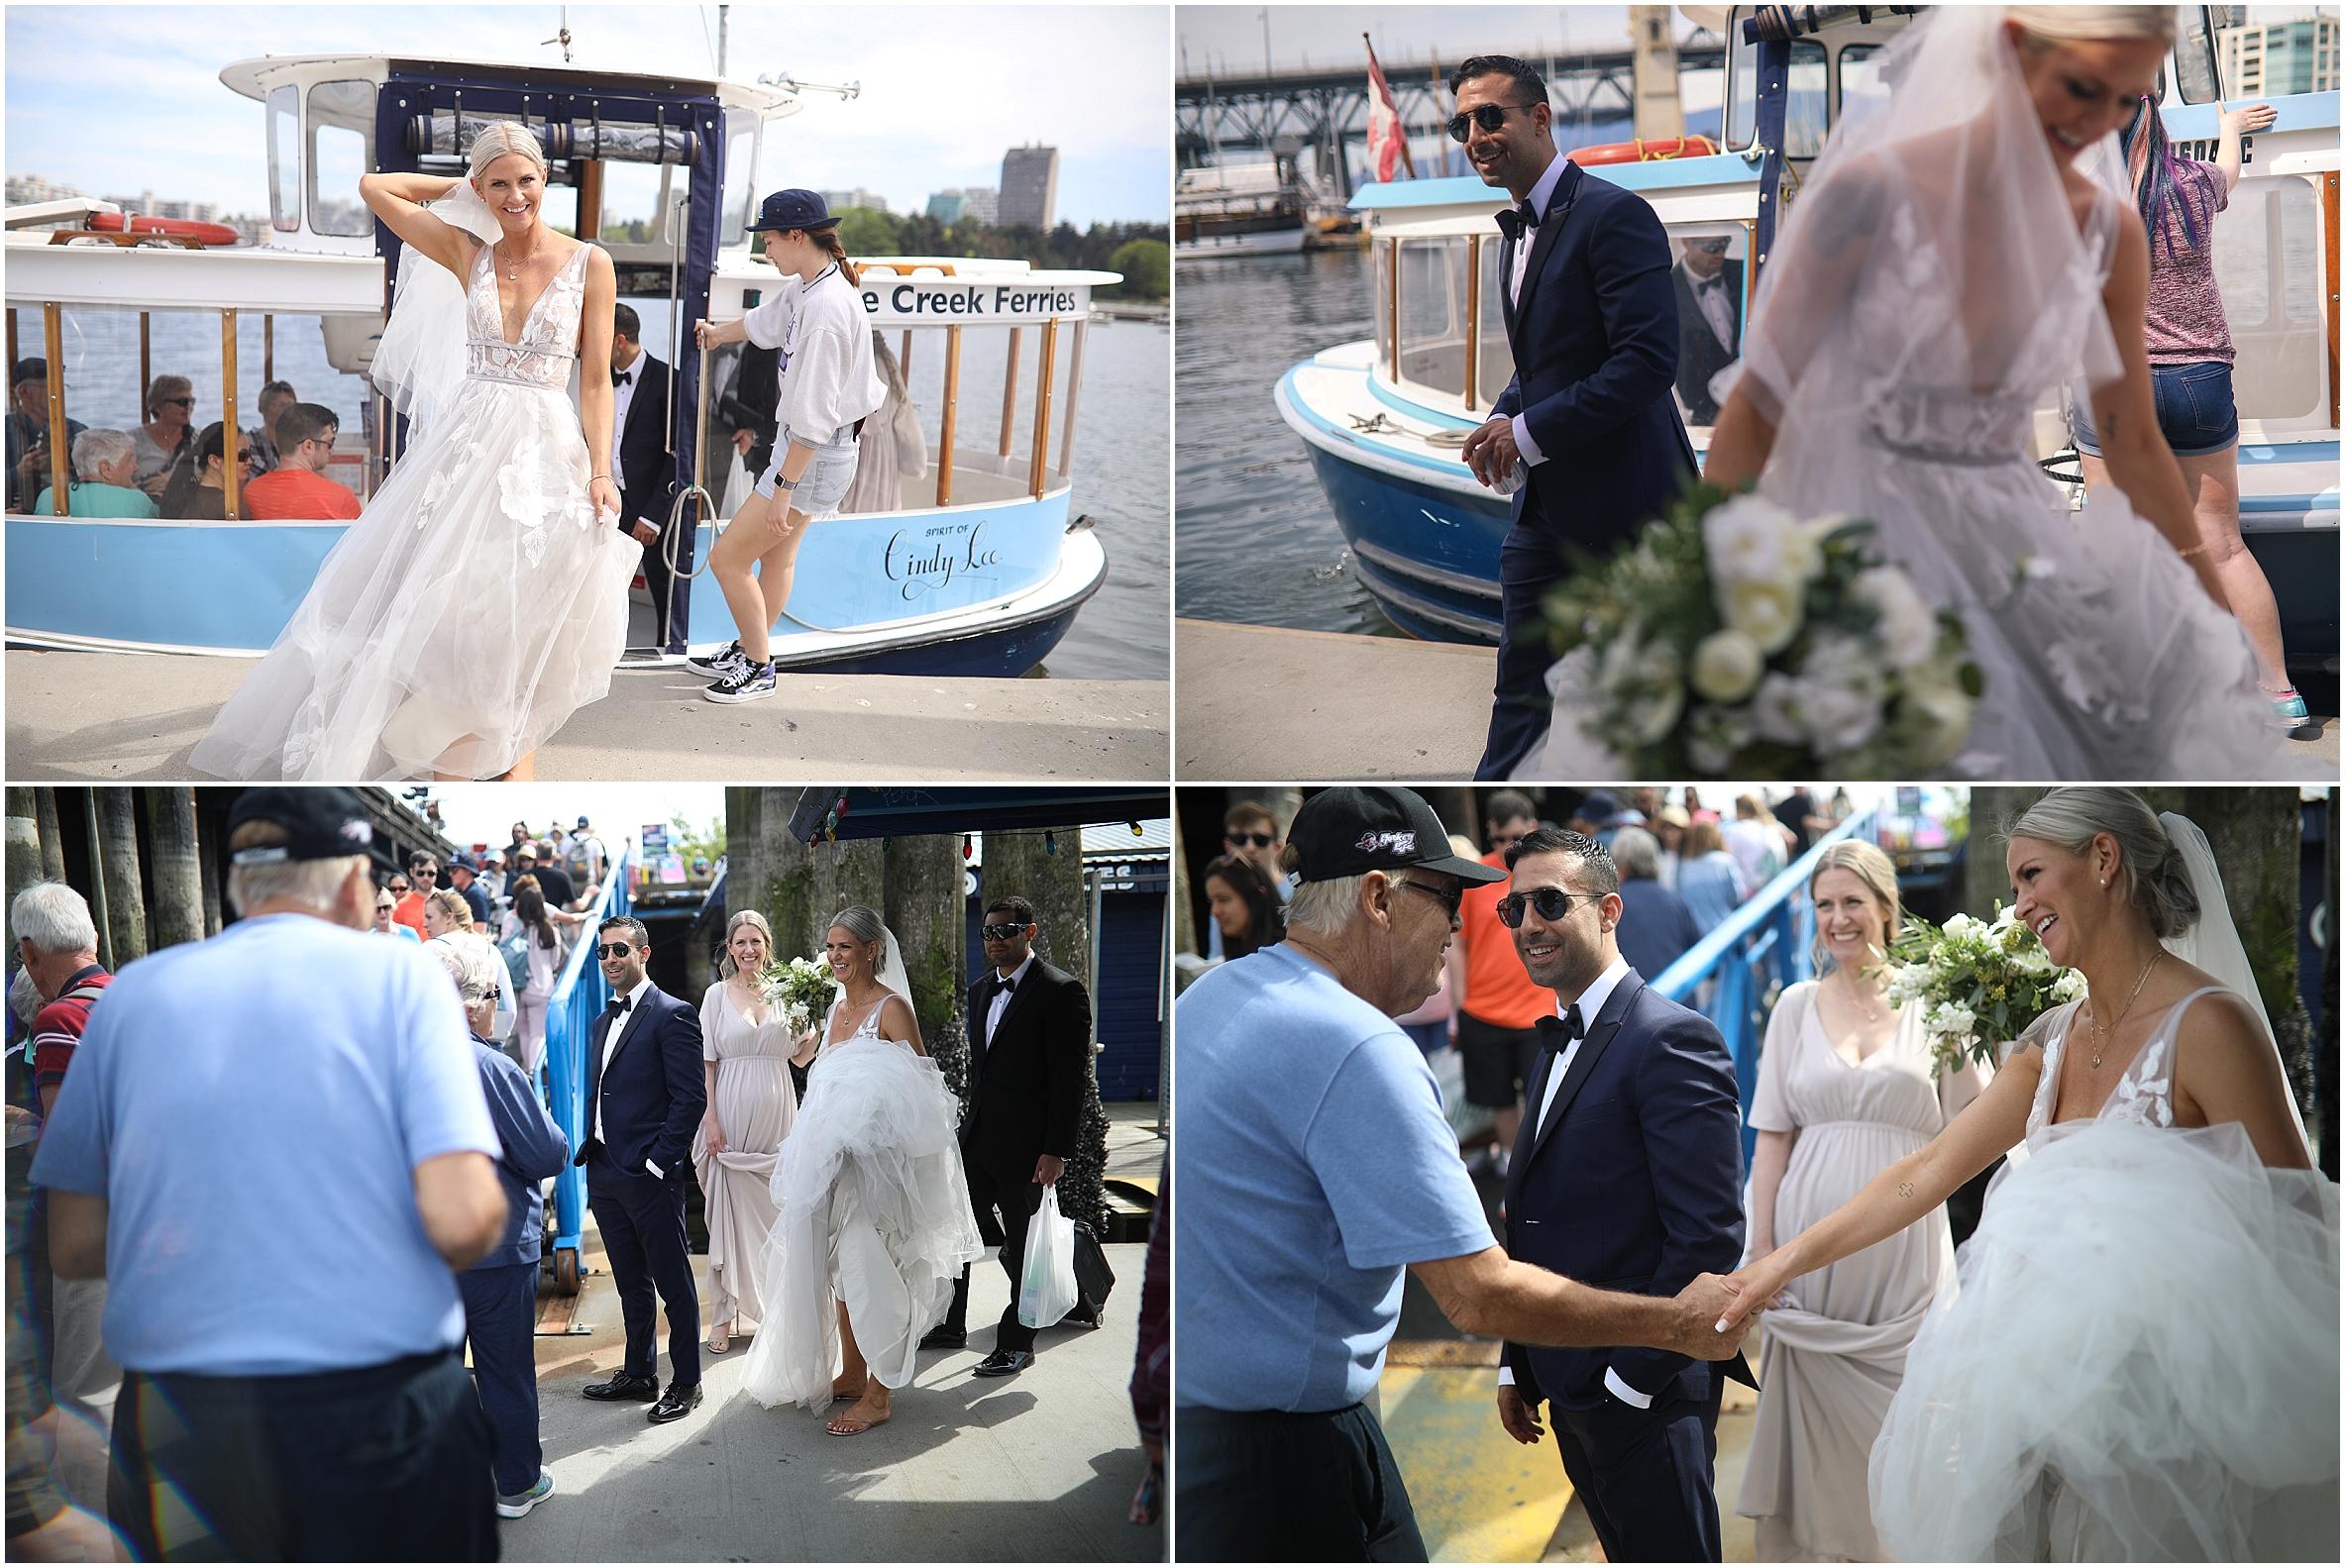 vancouver-wedding-photographer-the-loft-earls-yaletown_0015.jpg